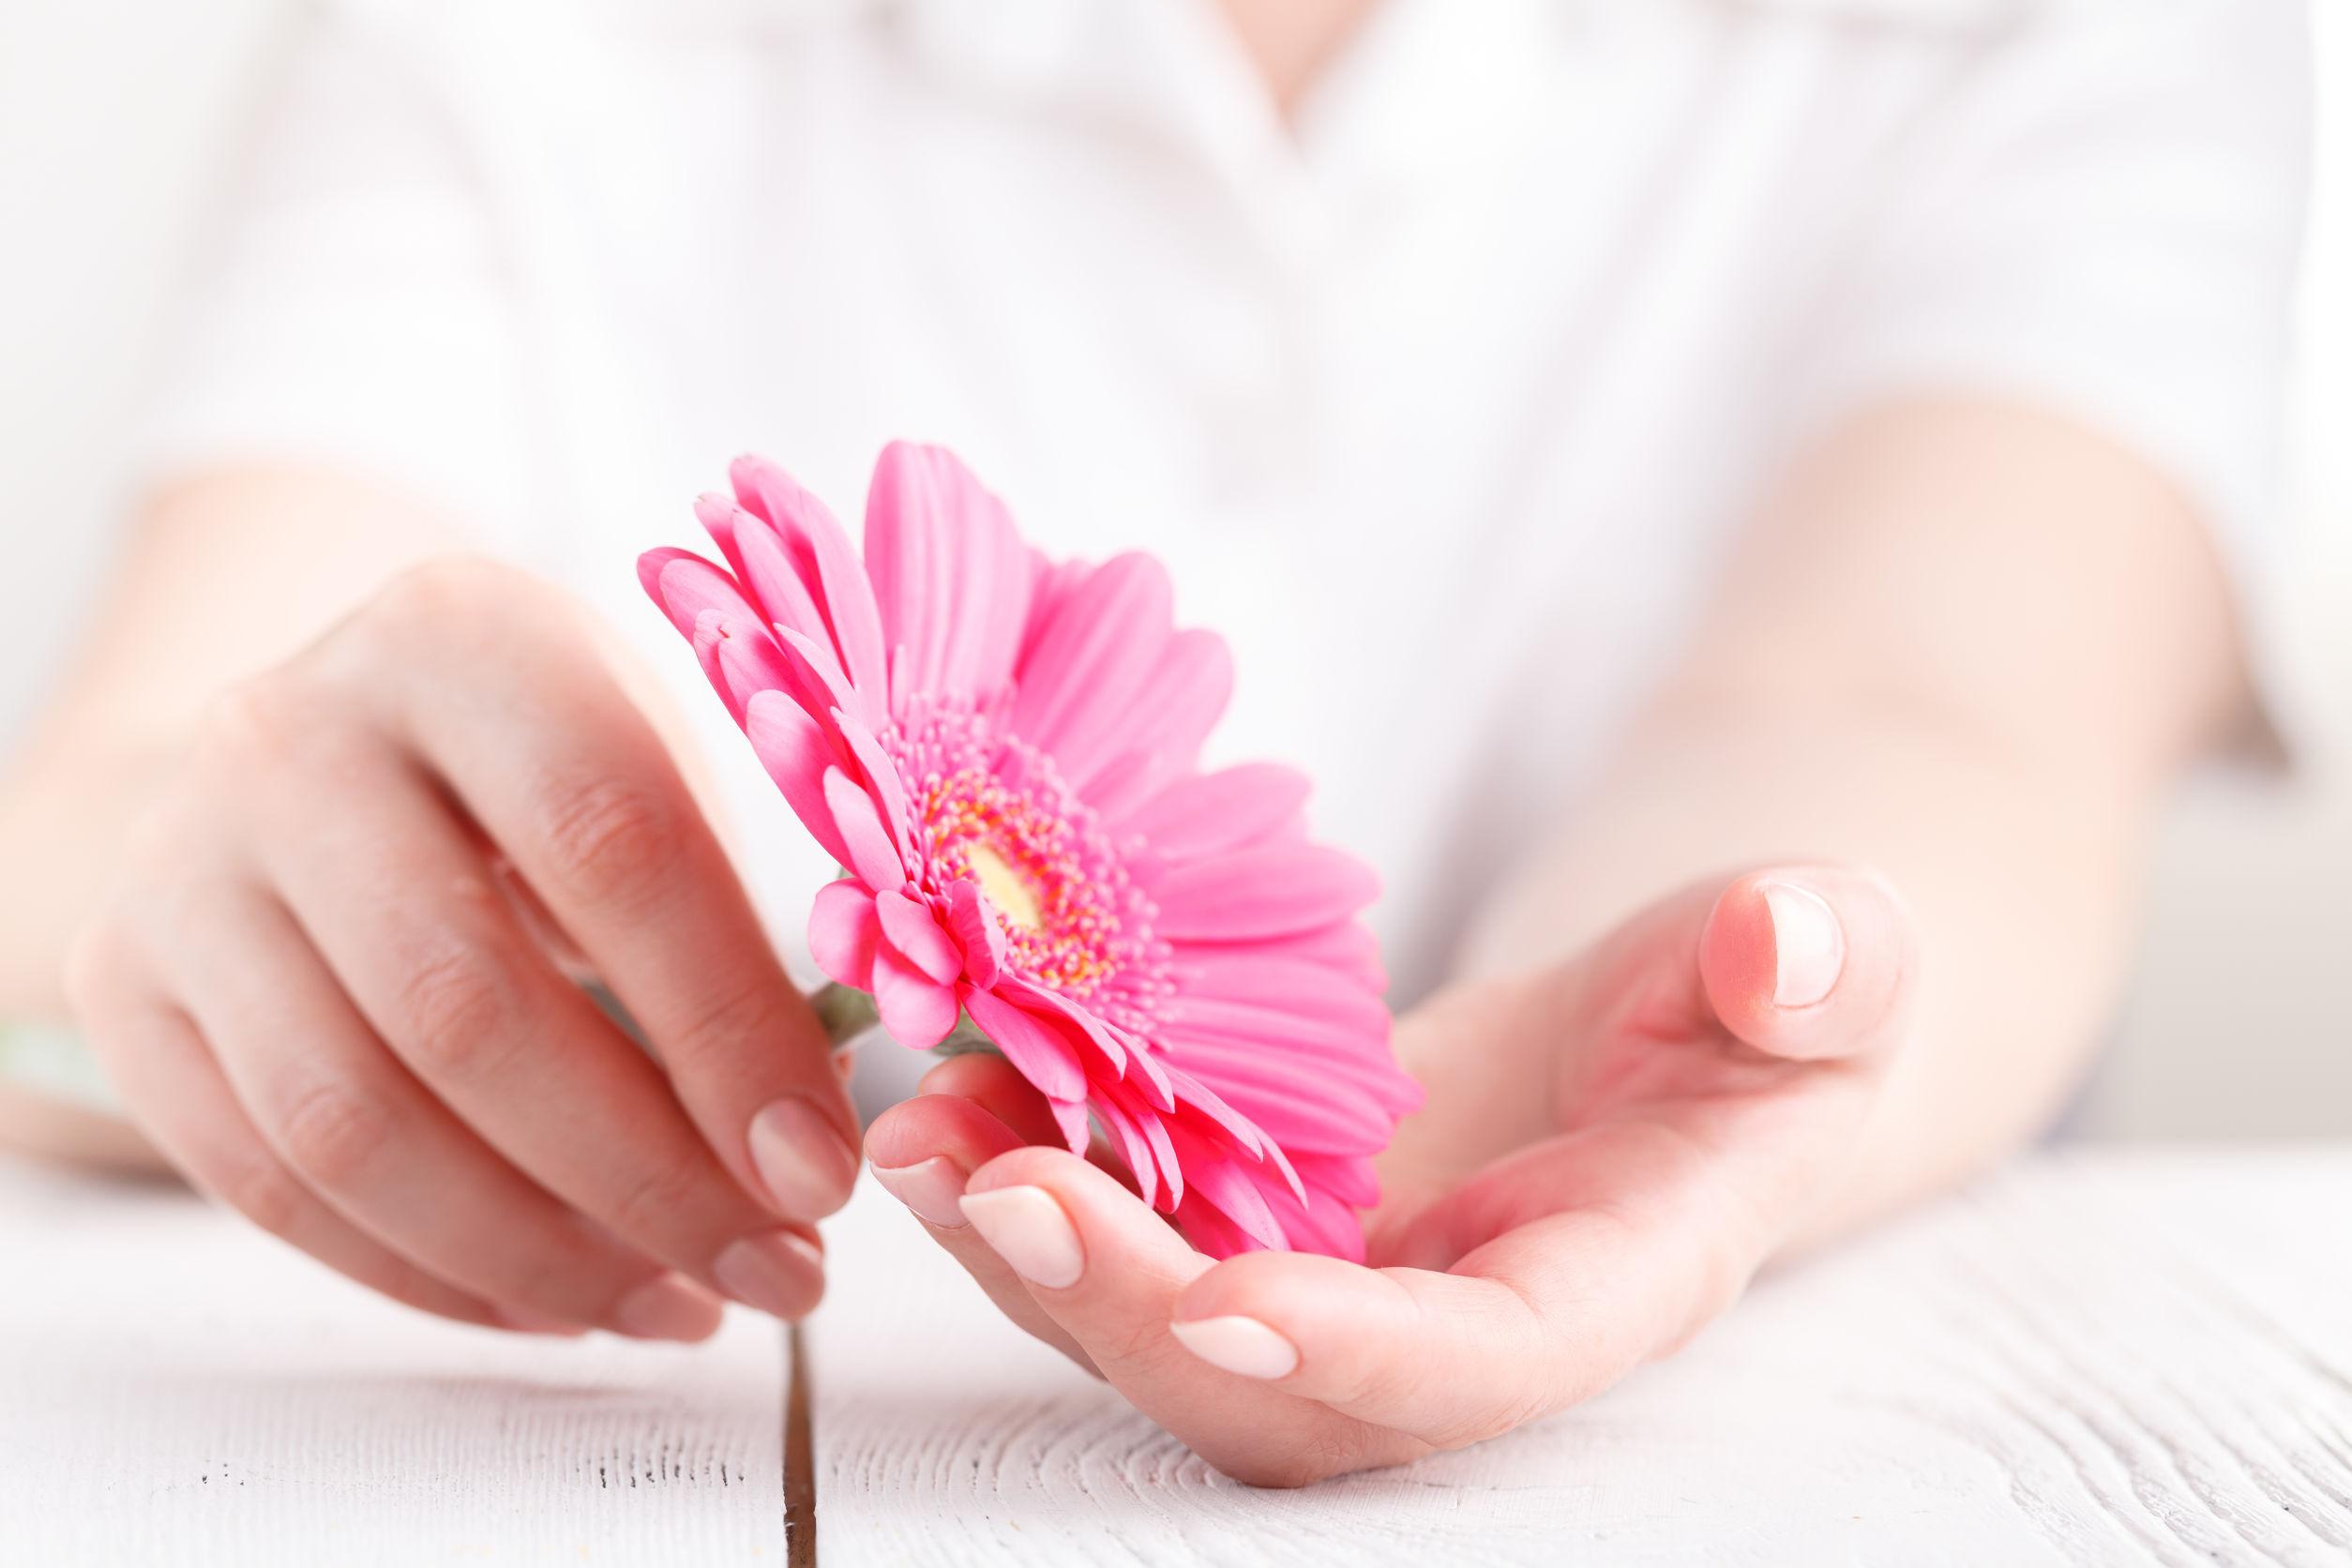 9 sintomas do câncer de colo de útero